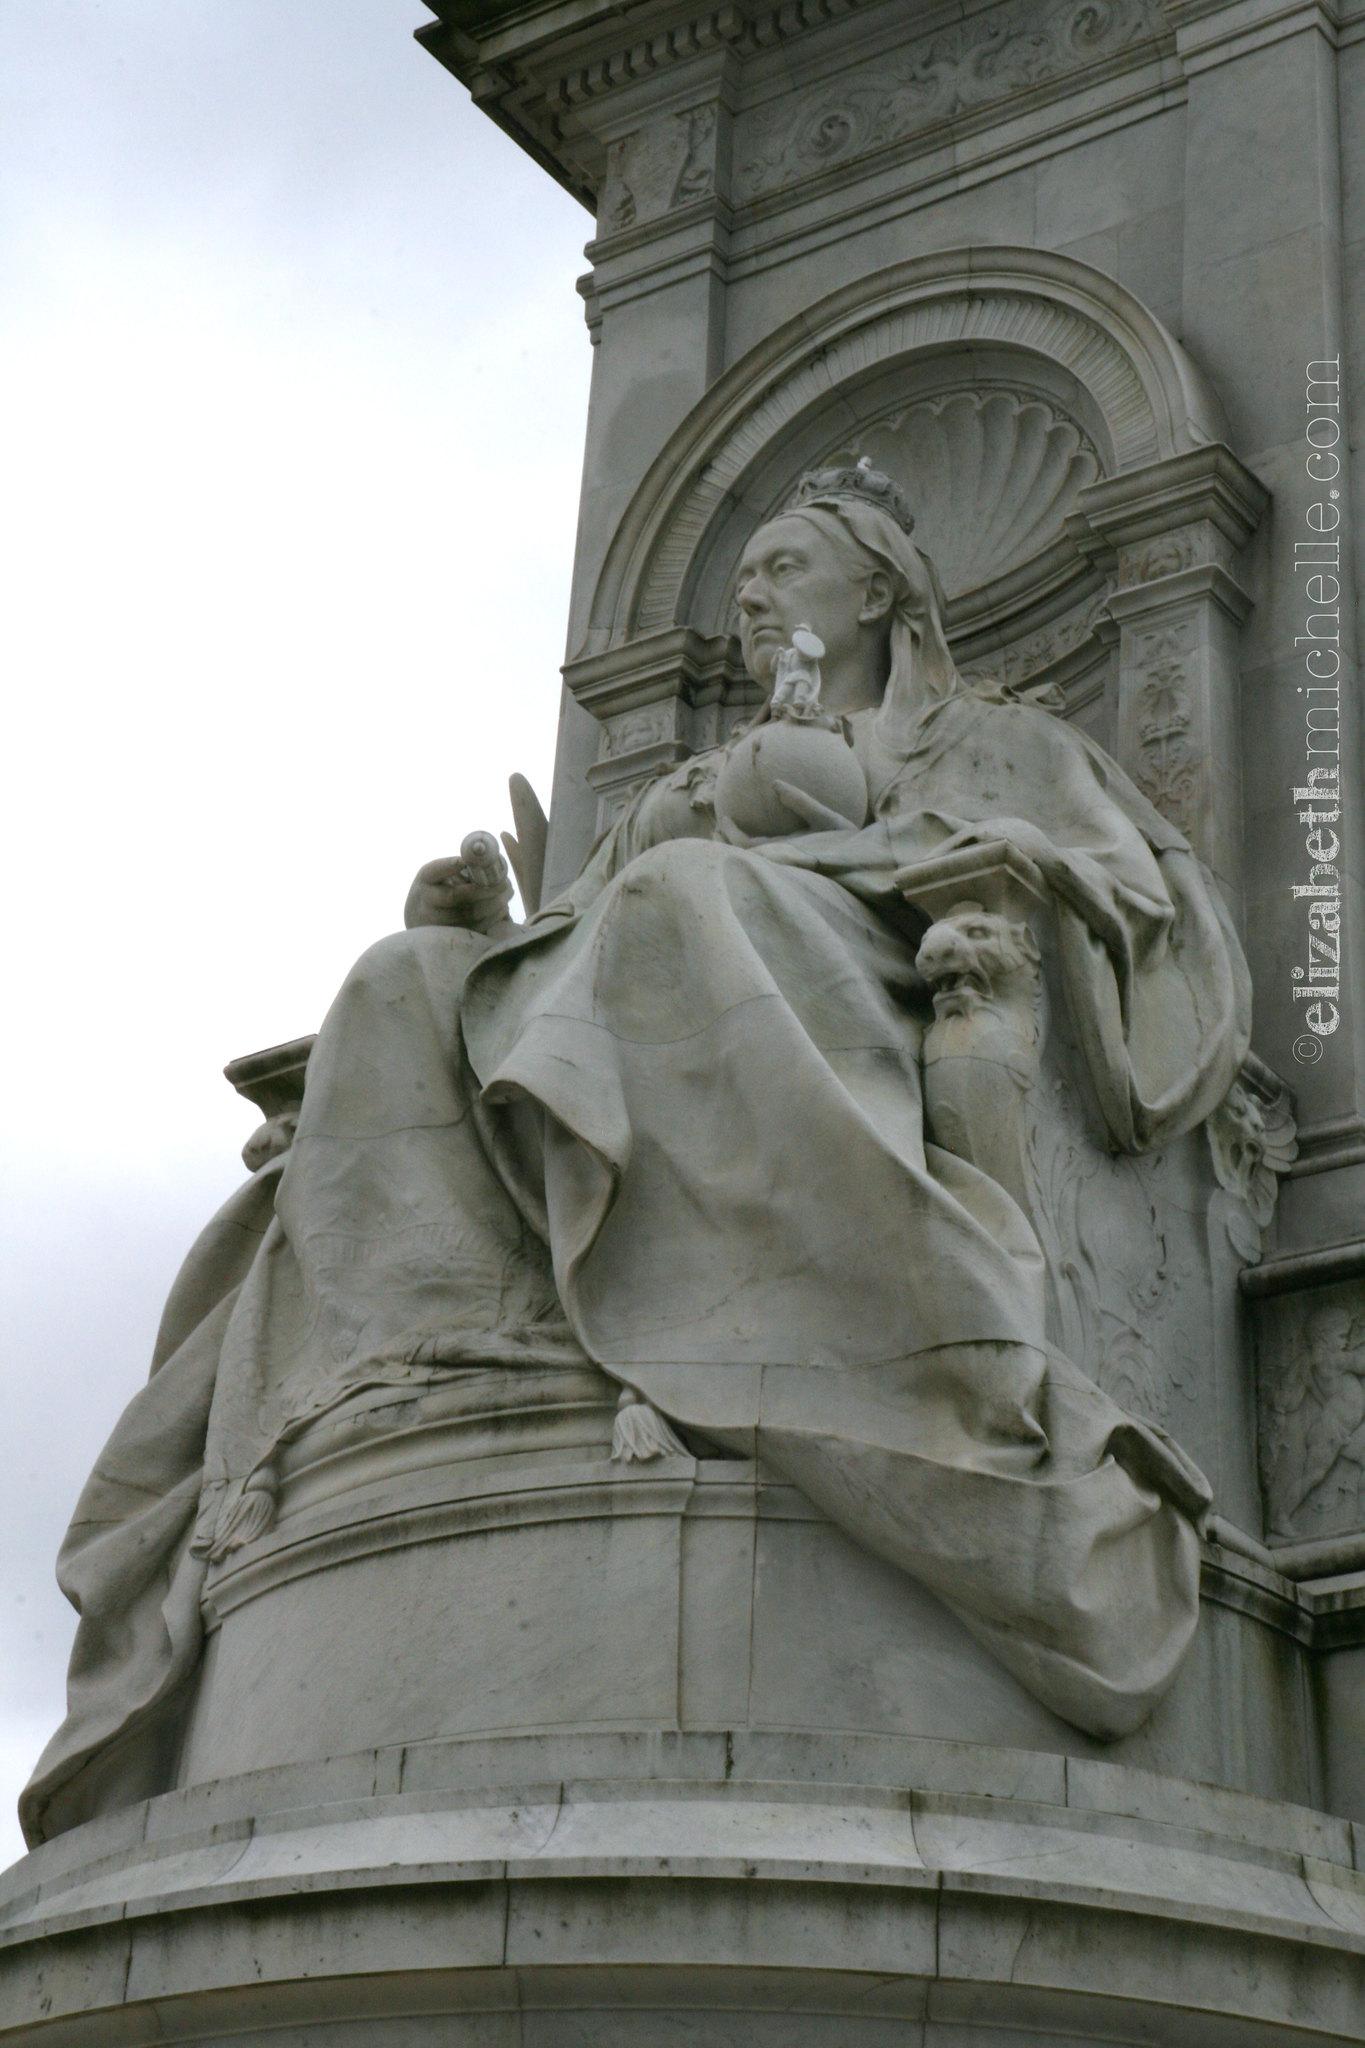 London - Victoria Memorial